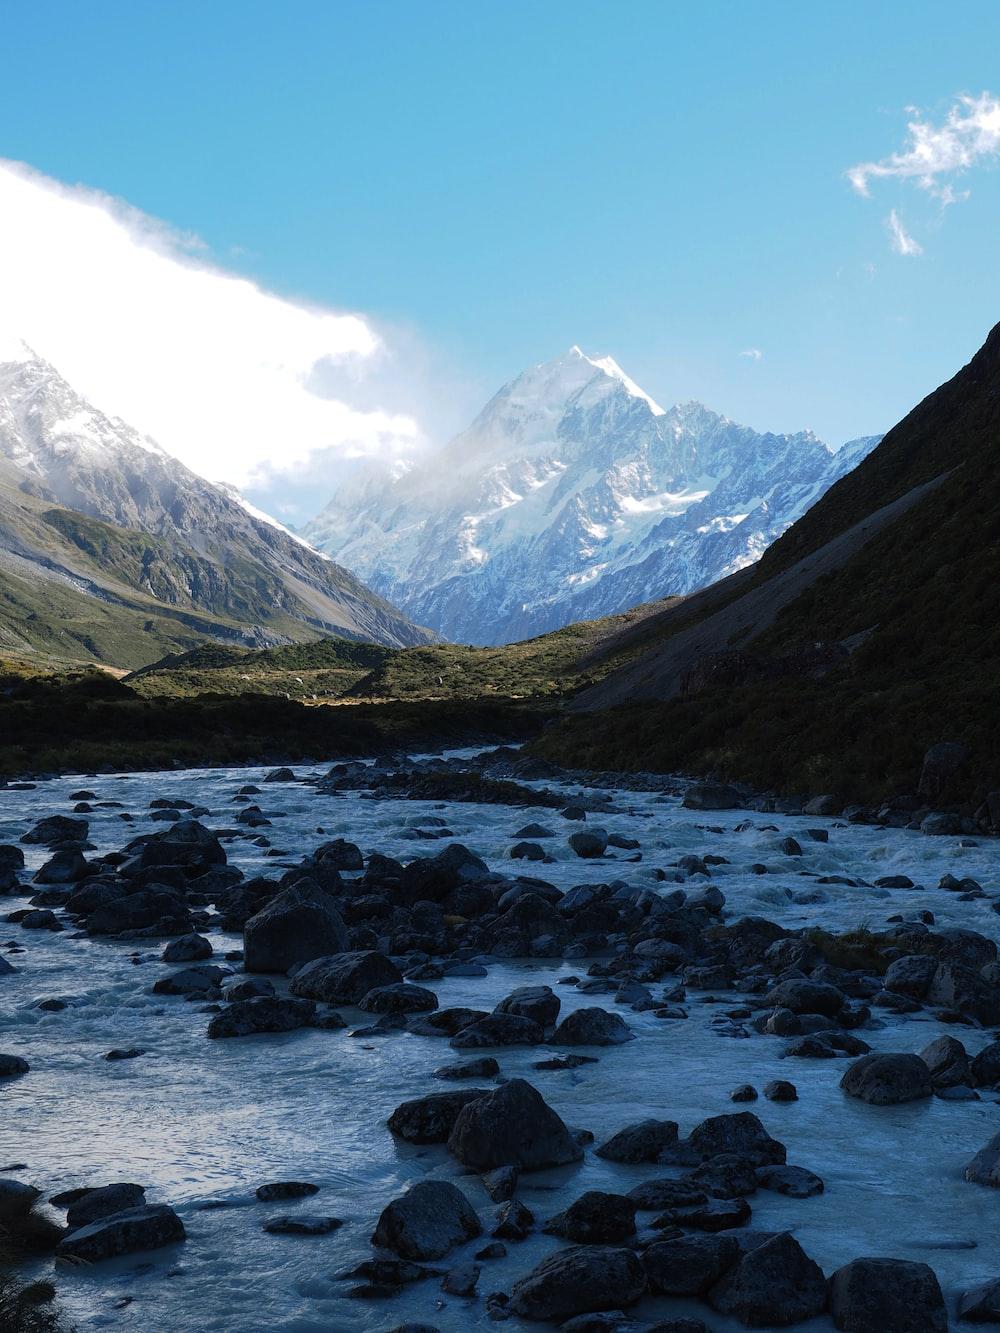 river near mountain